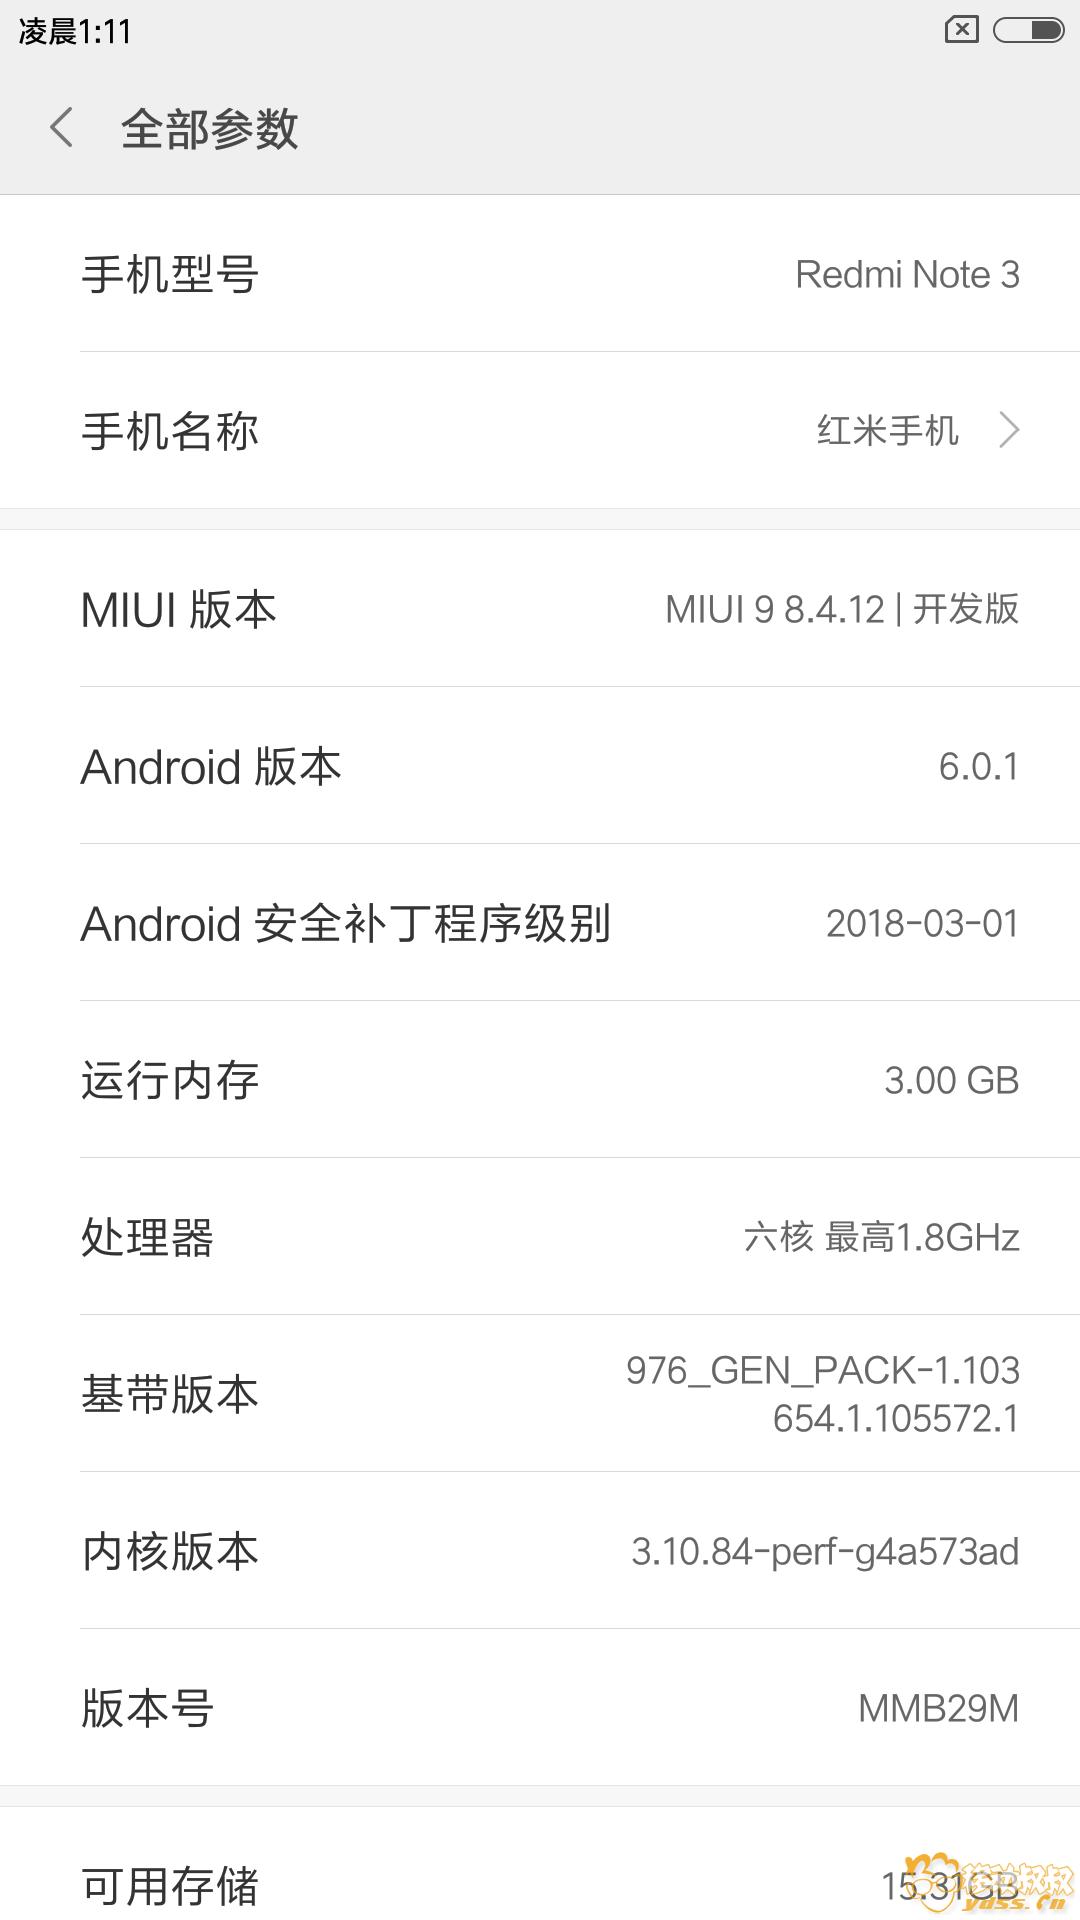 Screenshot_2016-01-01-01-11-15-099_com.android.settings.png